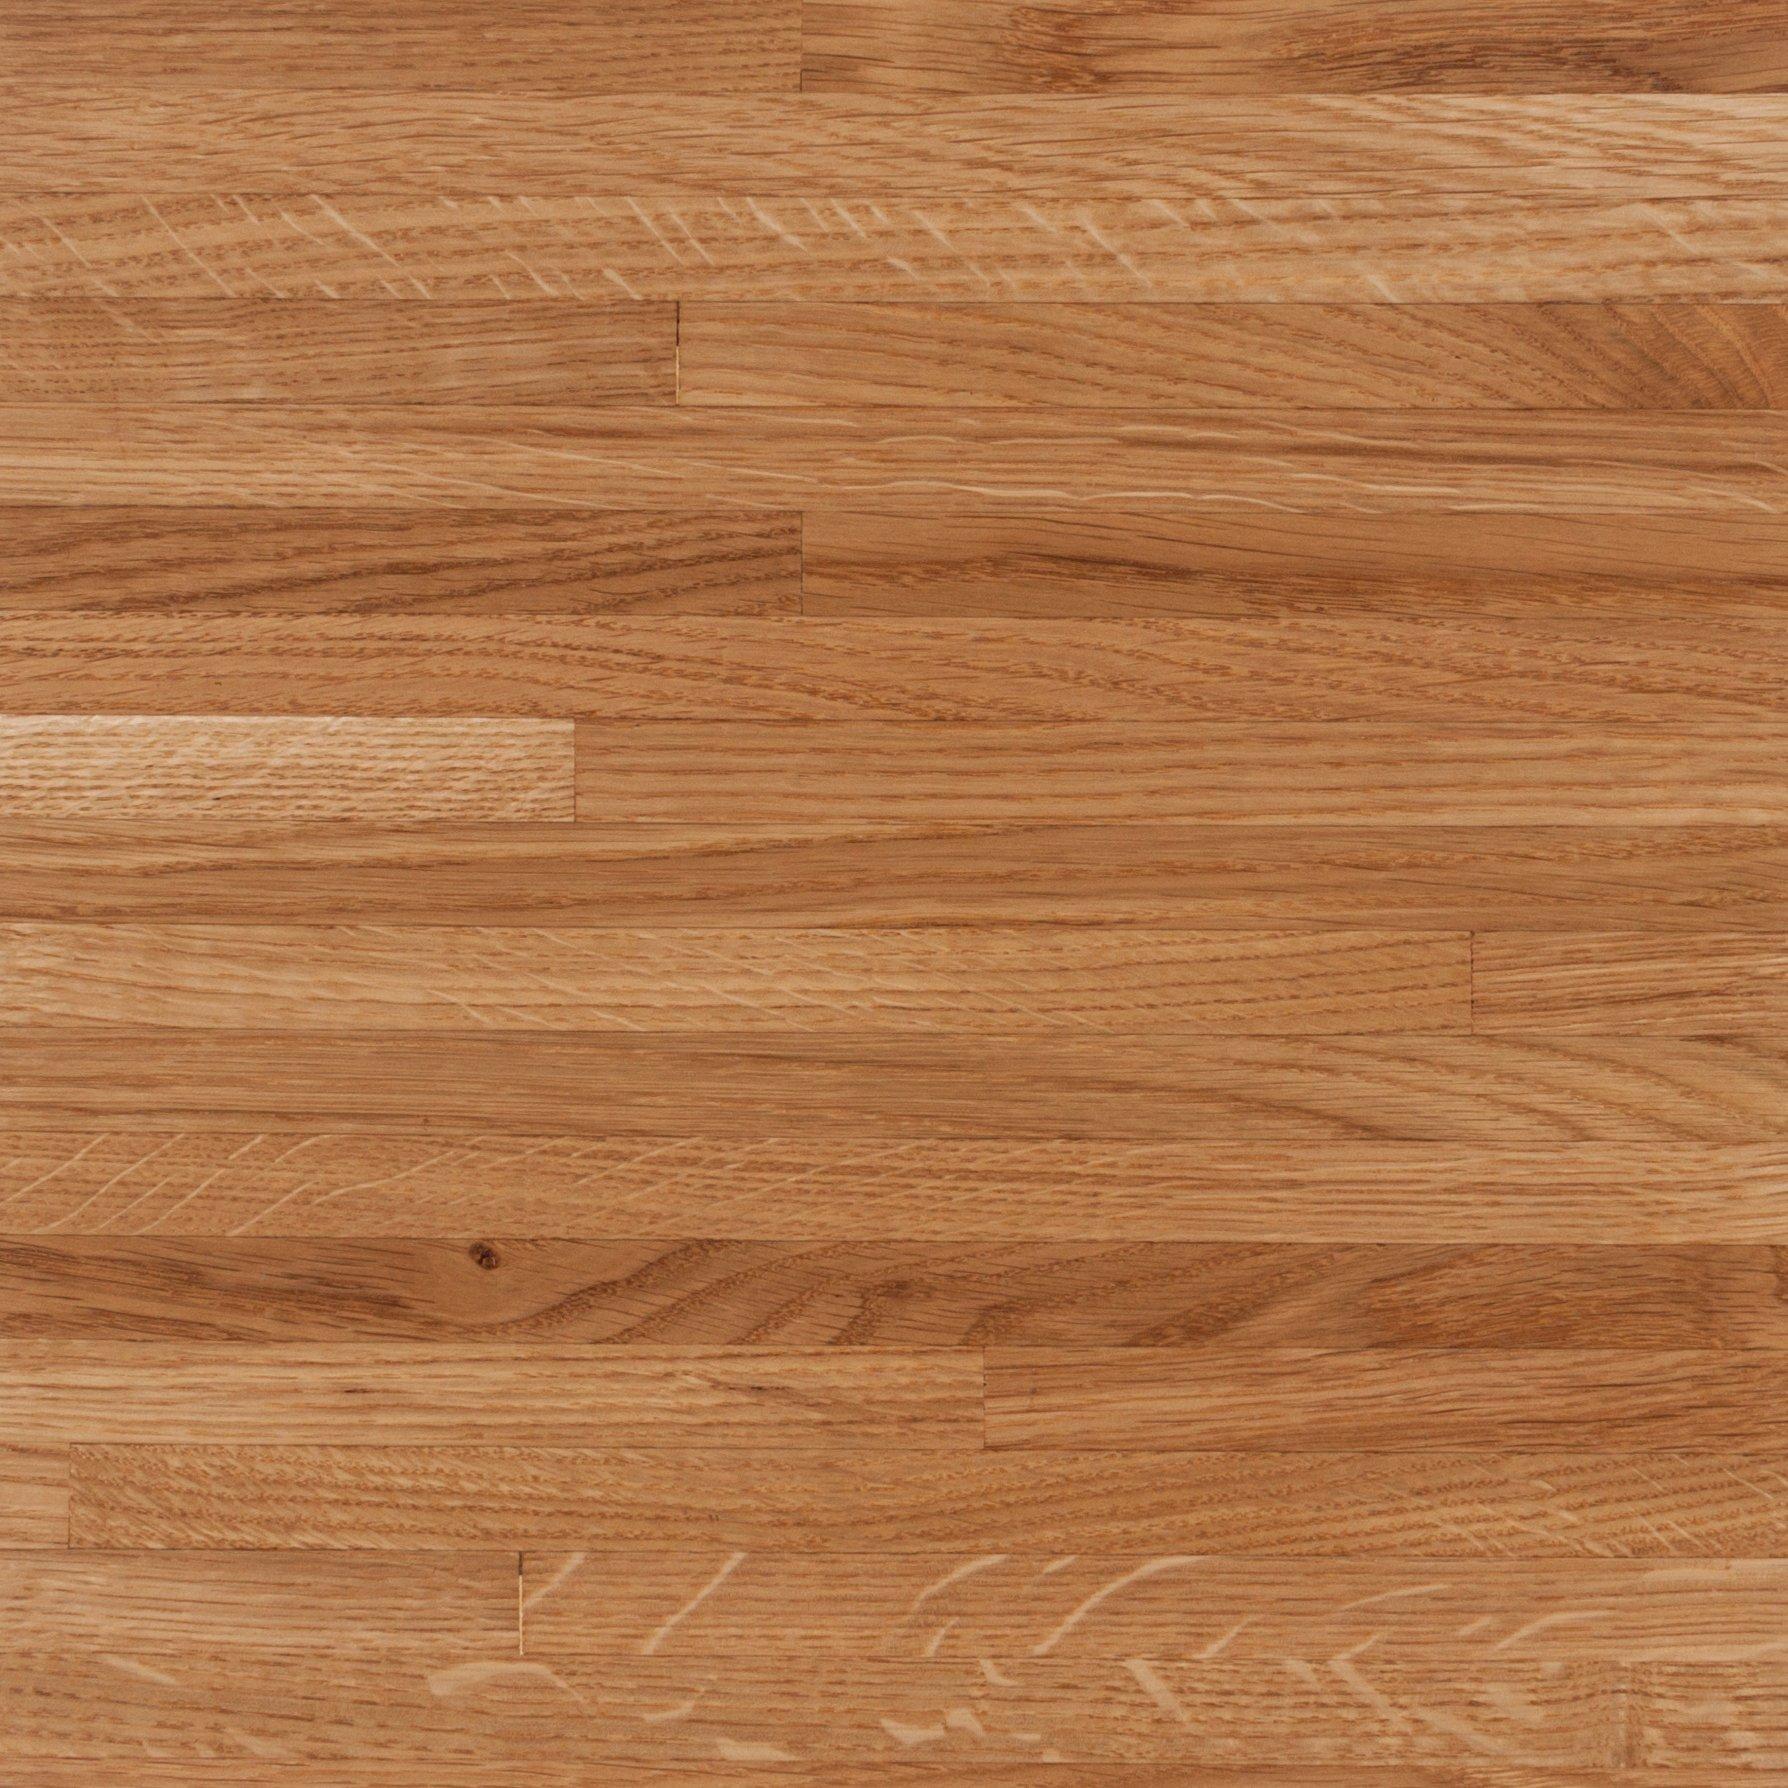 white oak butcher block countertop 12ft